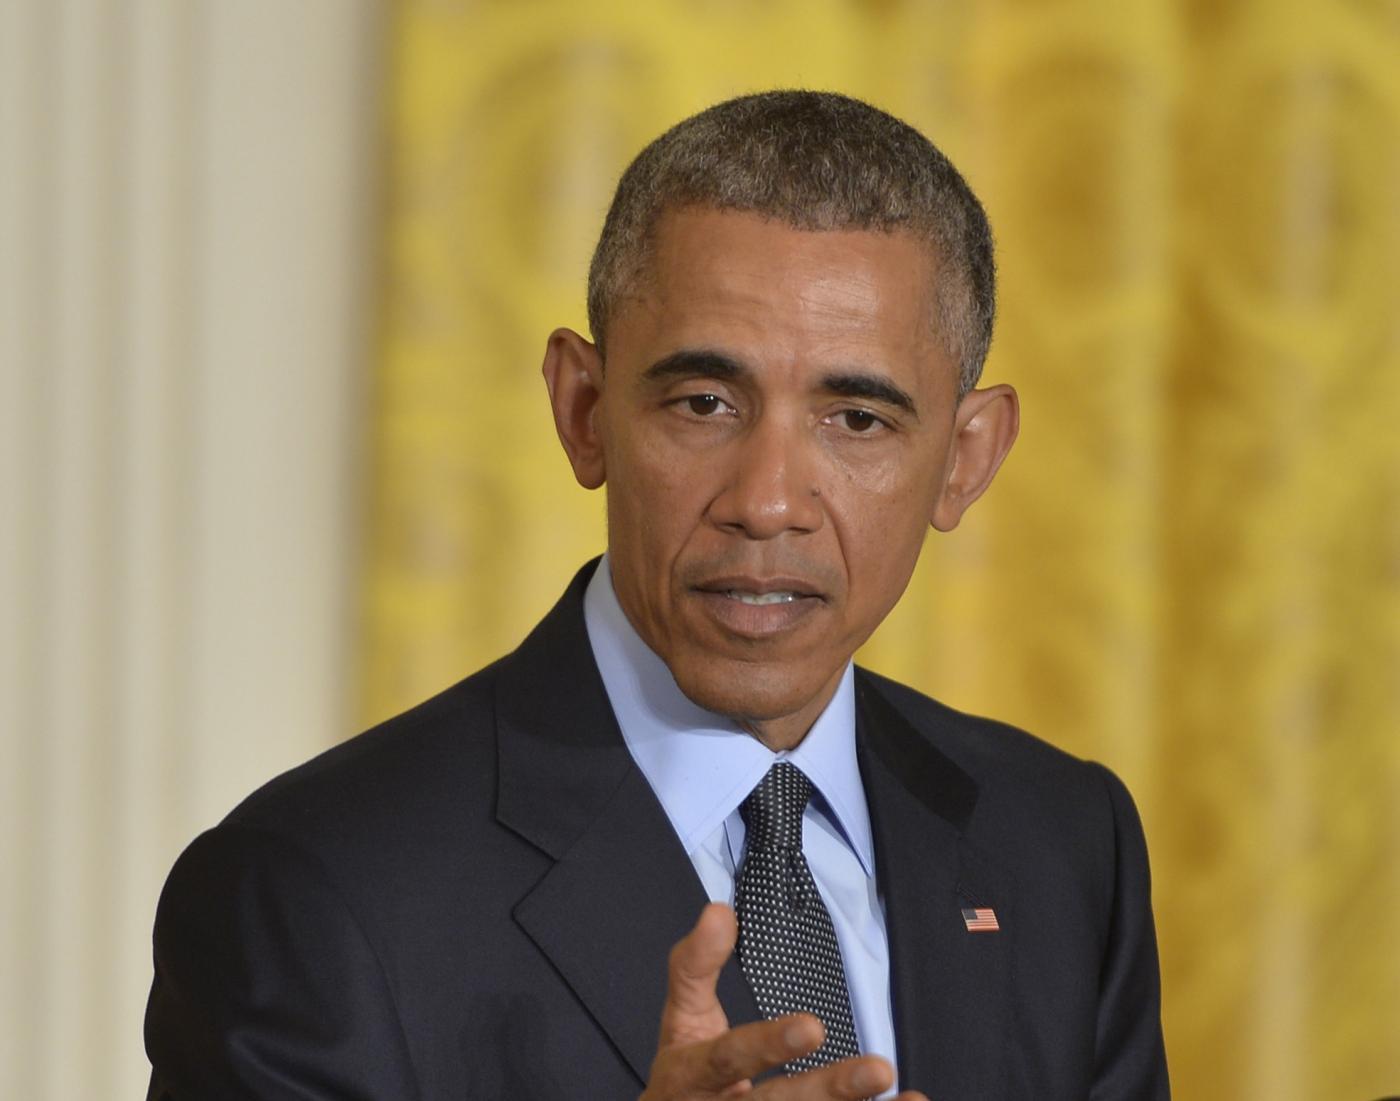 US President Barack Obama. (File Photo: Xinhua/Bao Dandan/IANS) by .